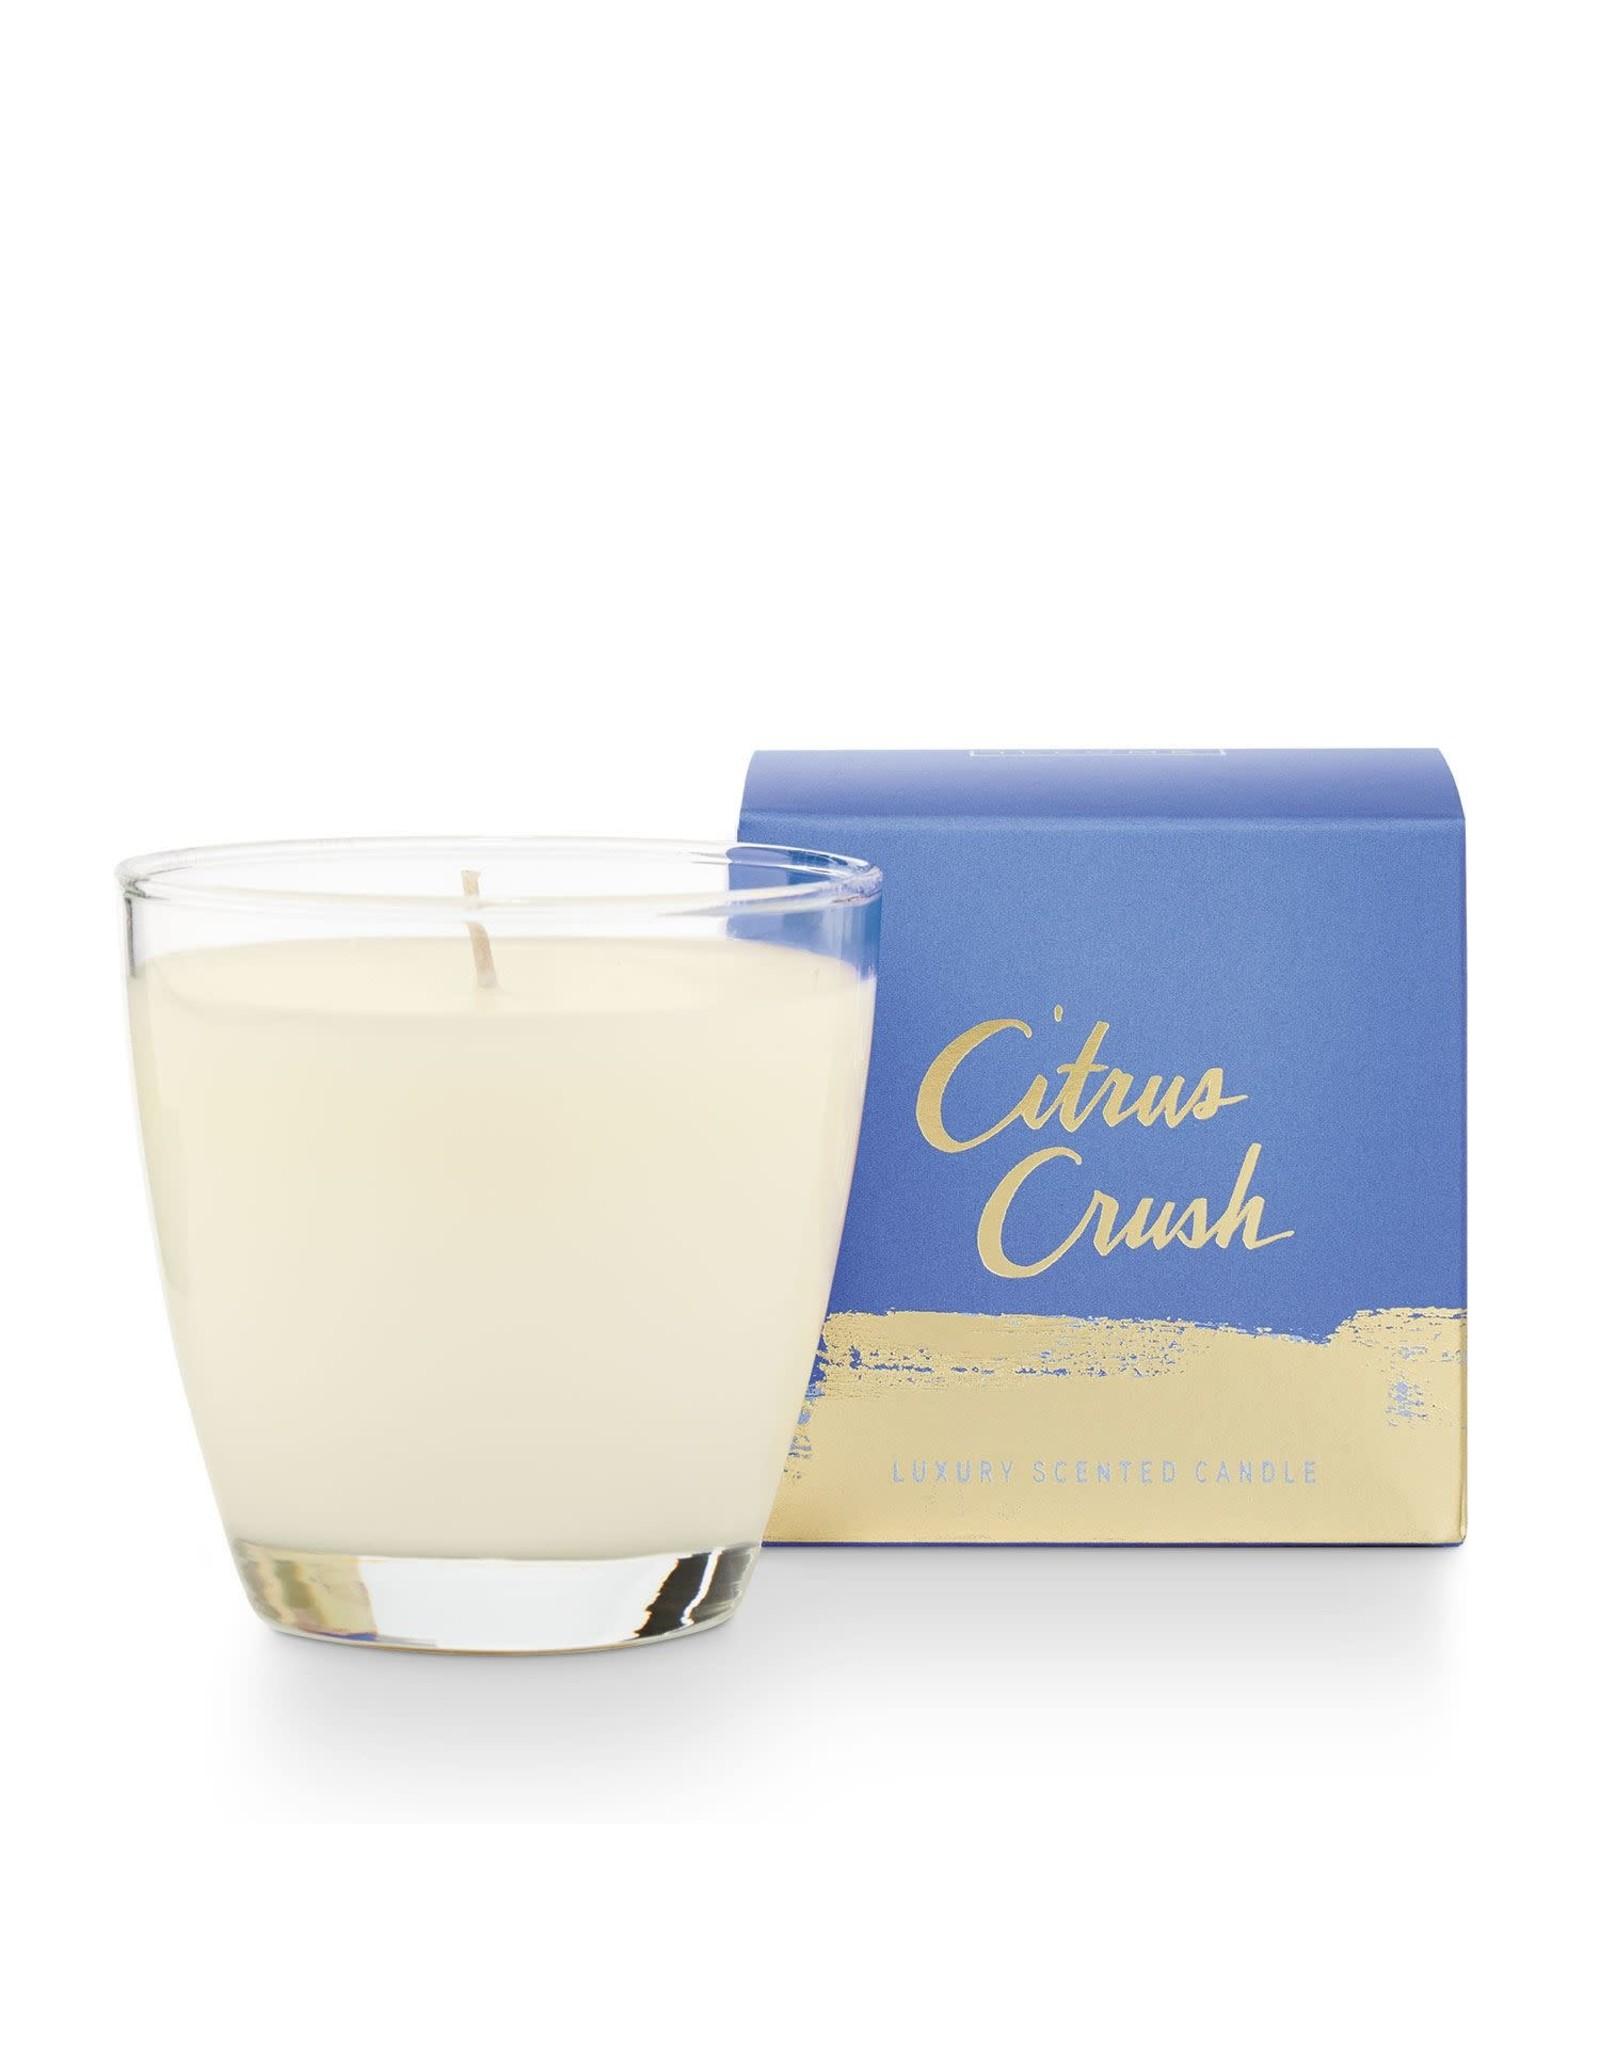 Illume Citrus Crush Glass Candle - 4.7oz